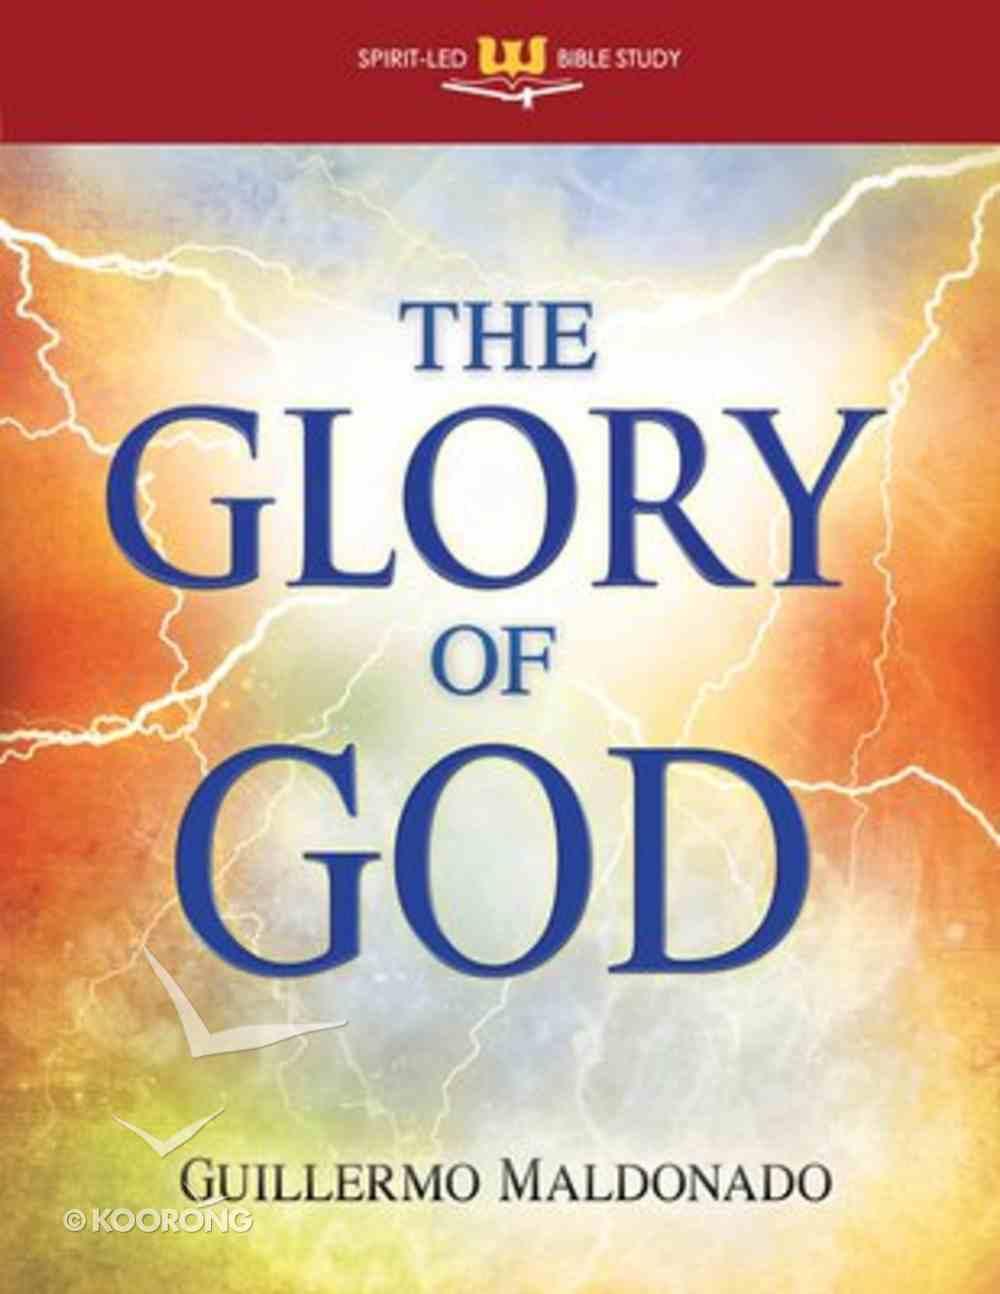 The Glory of God: Spirit Led Bible Study Paperback